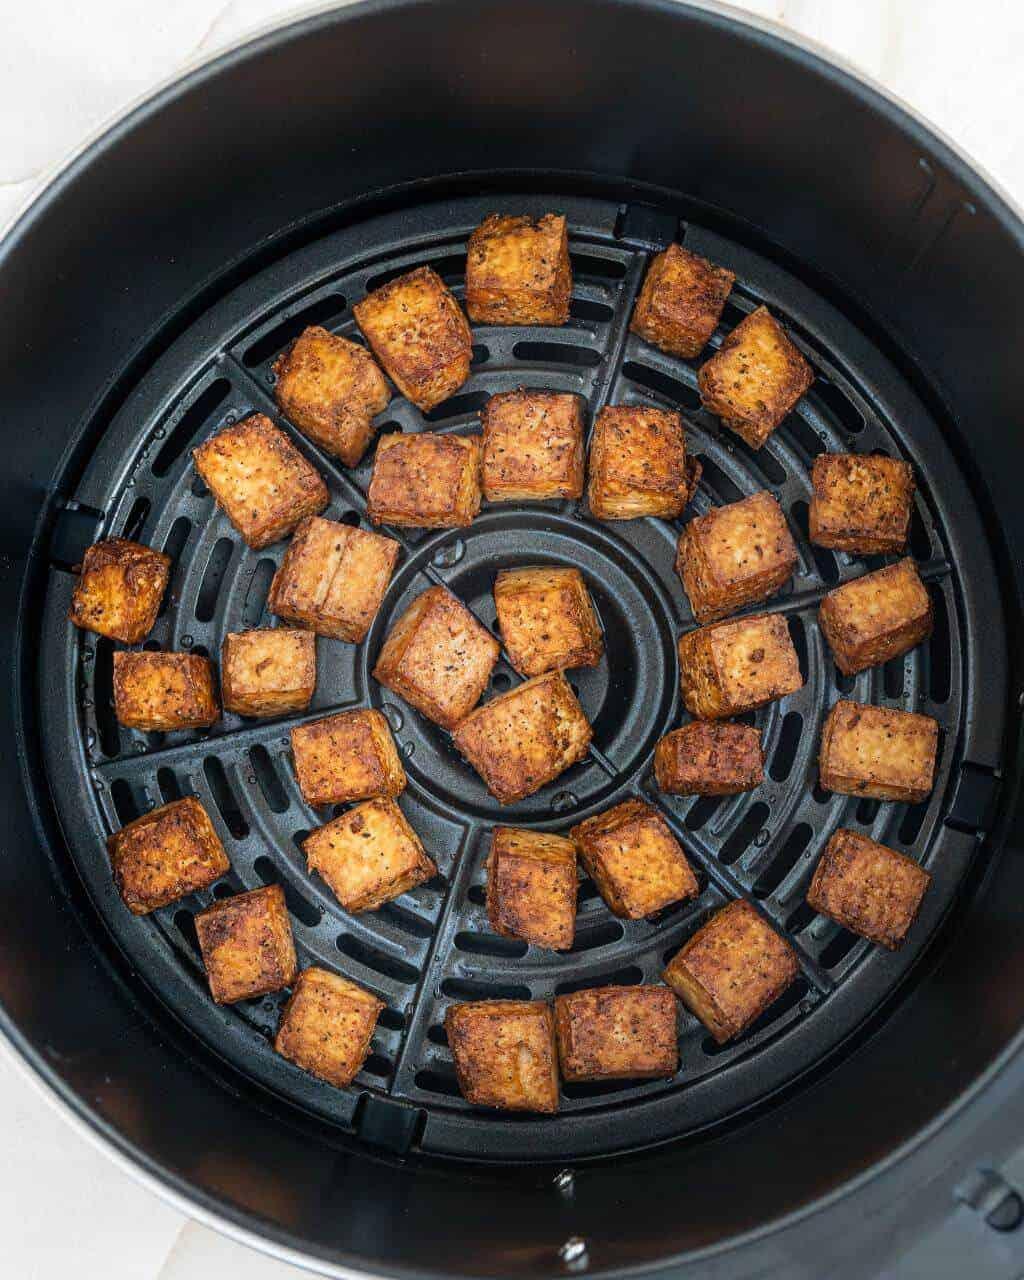 Crispy Tofu inside an Air Fryer